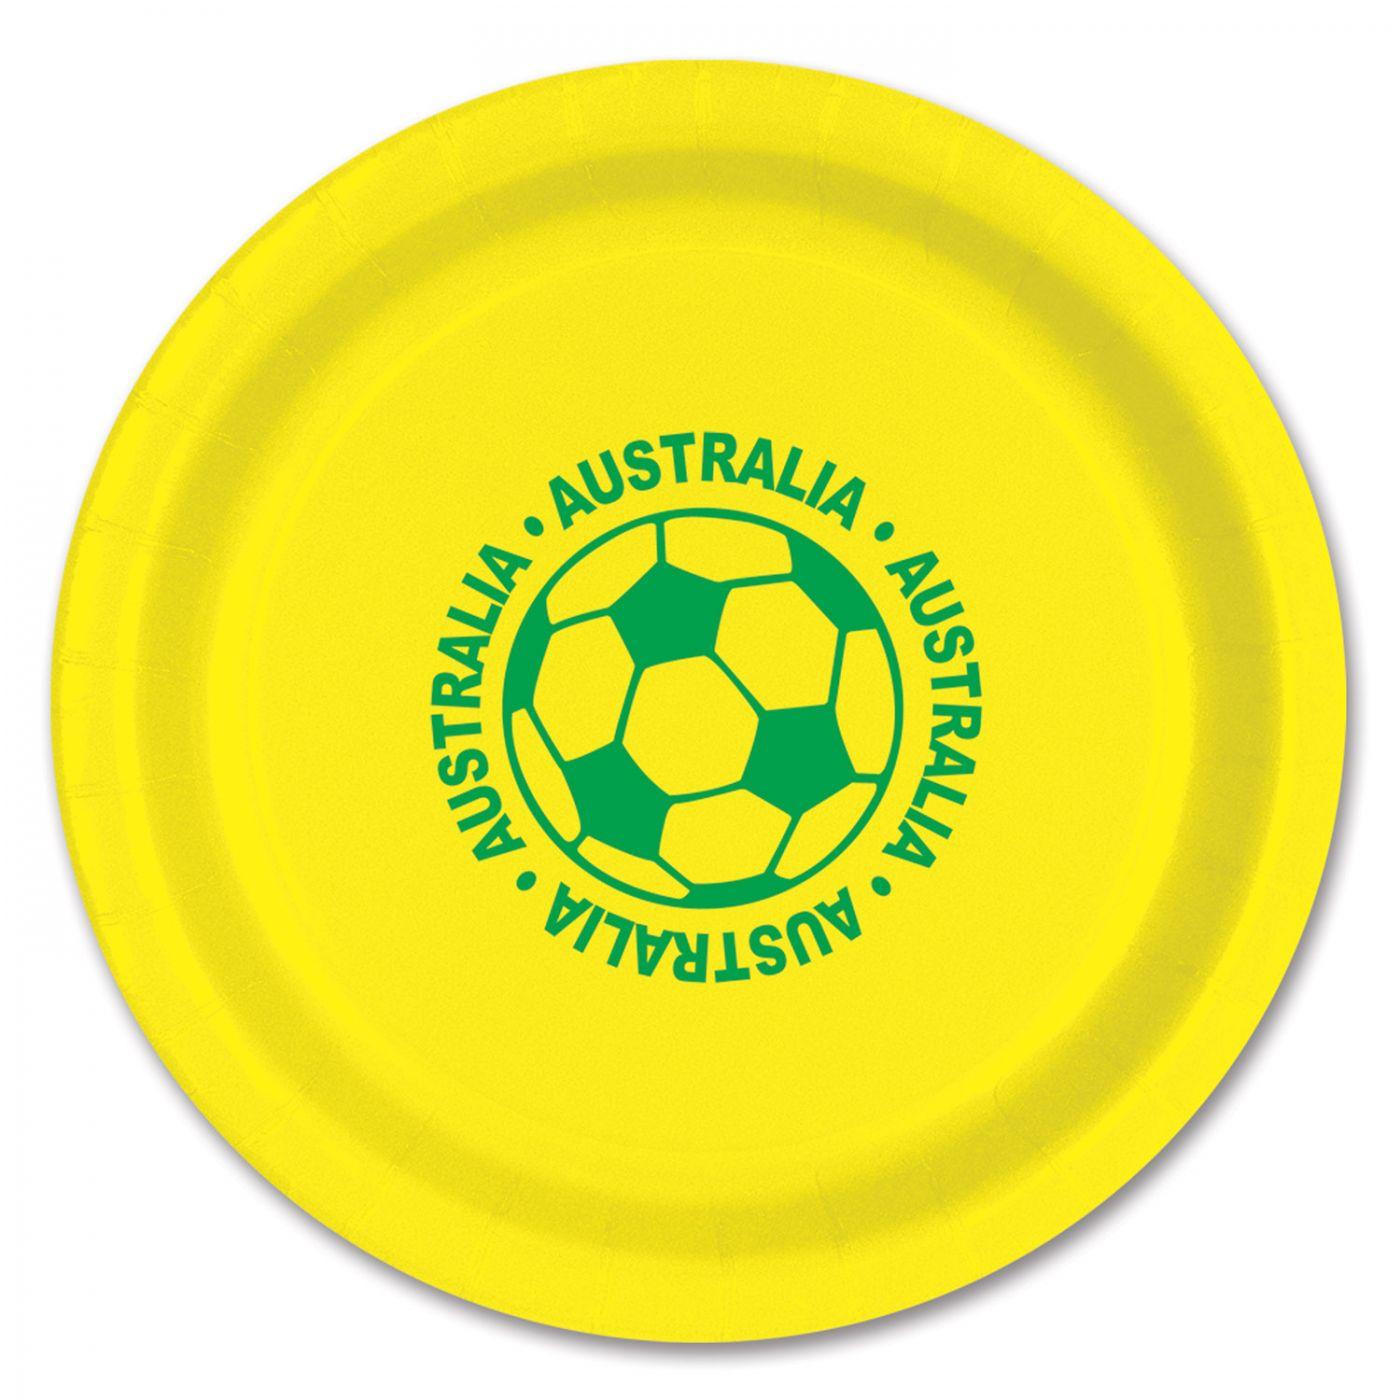 Plates - Australia image